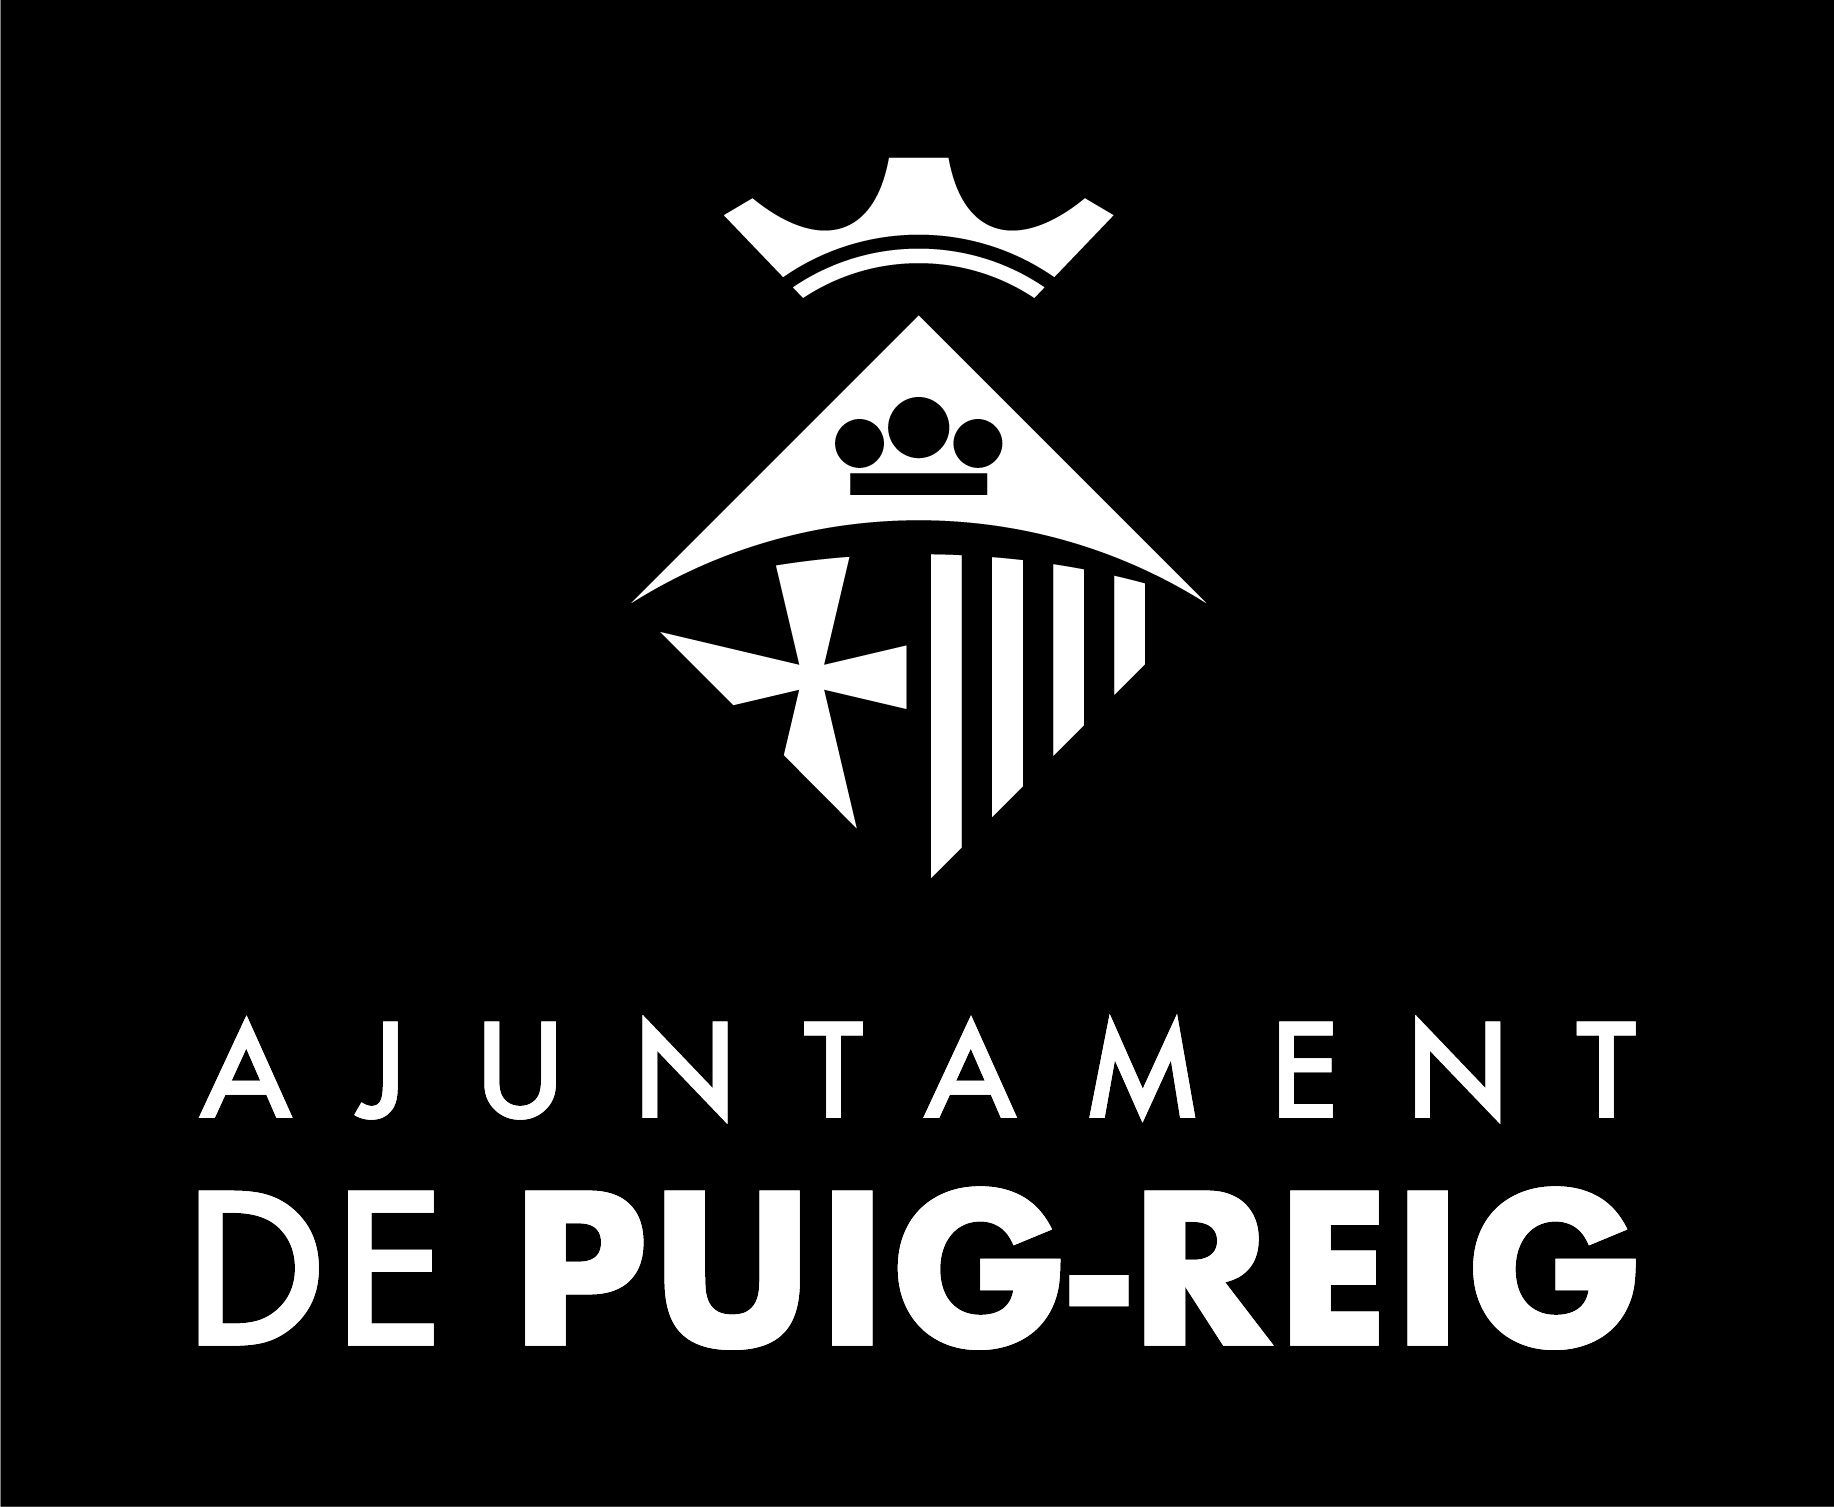 Logo Puig-reig V invertit